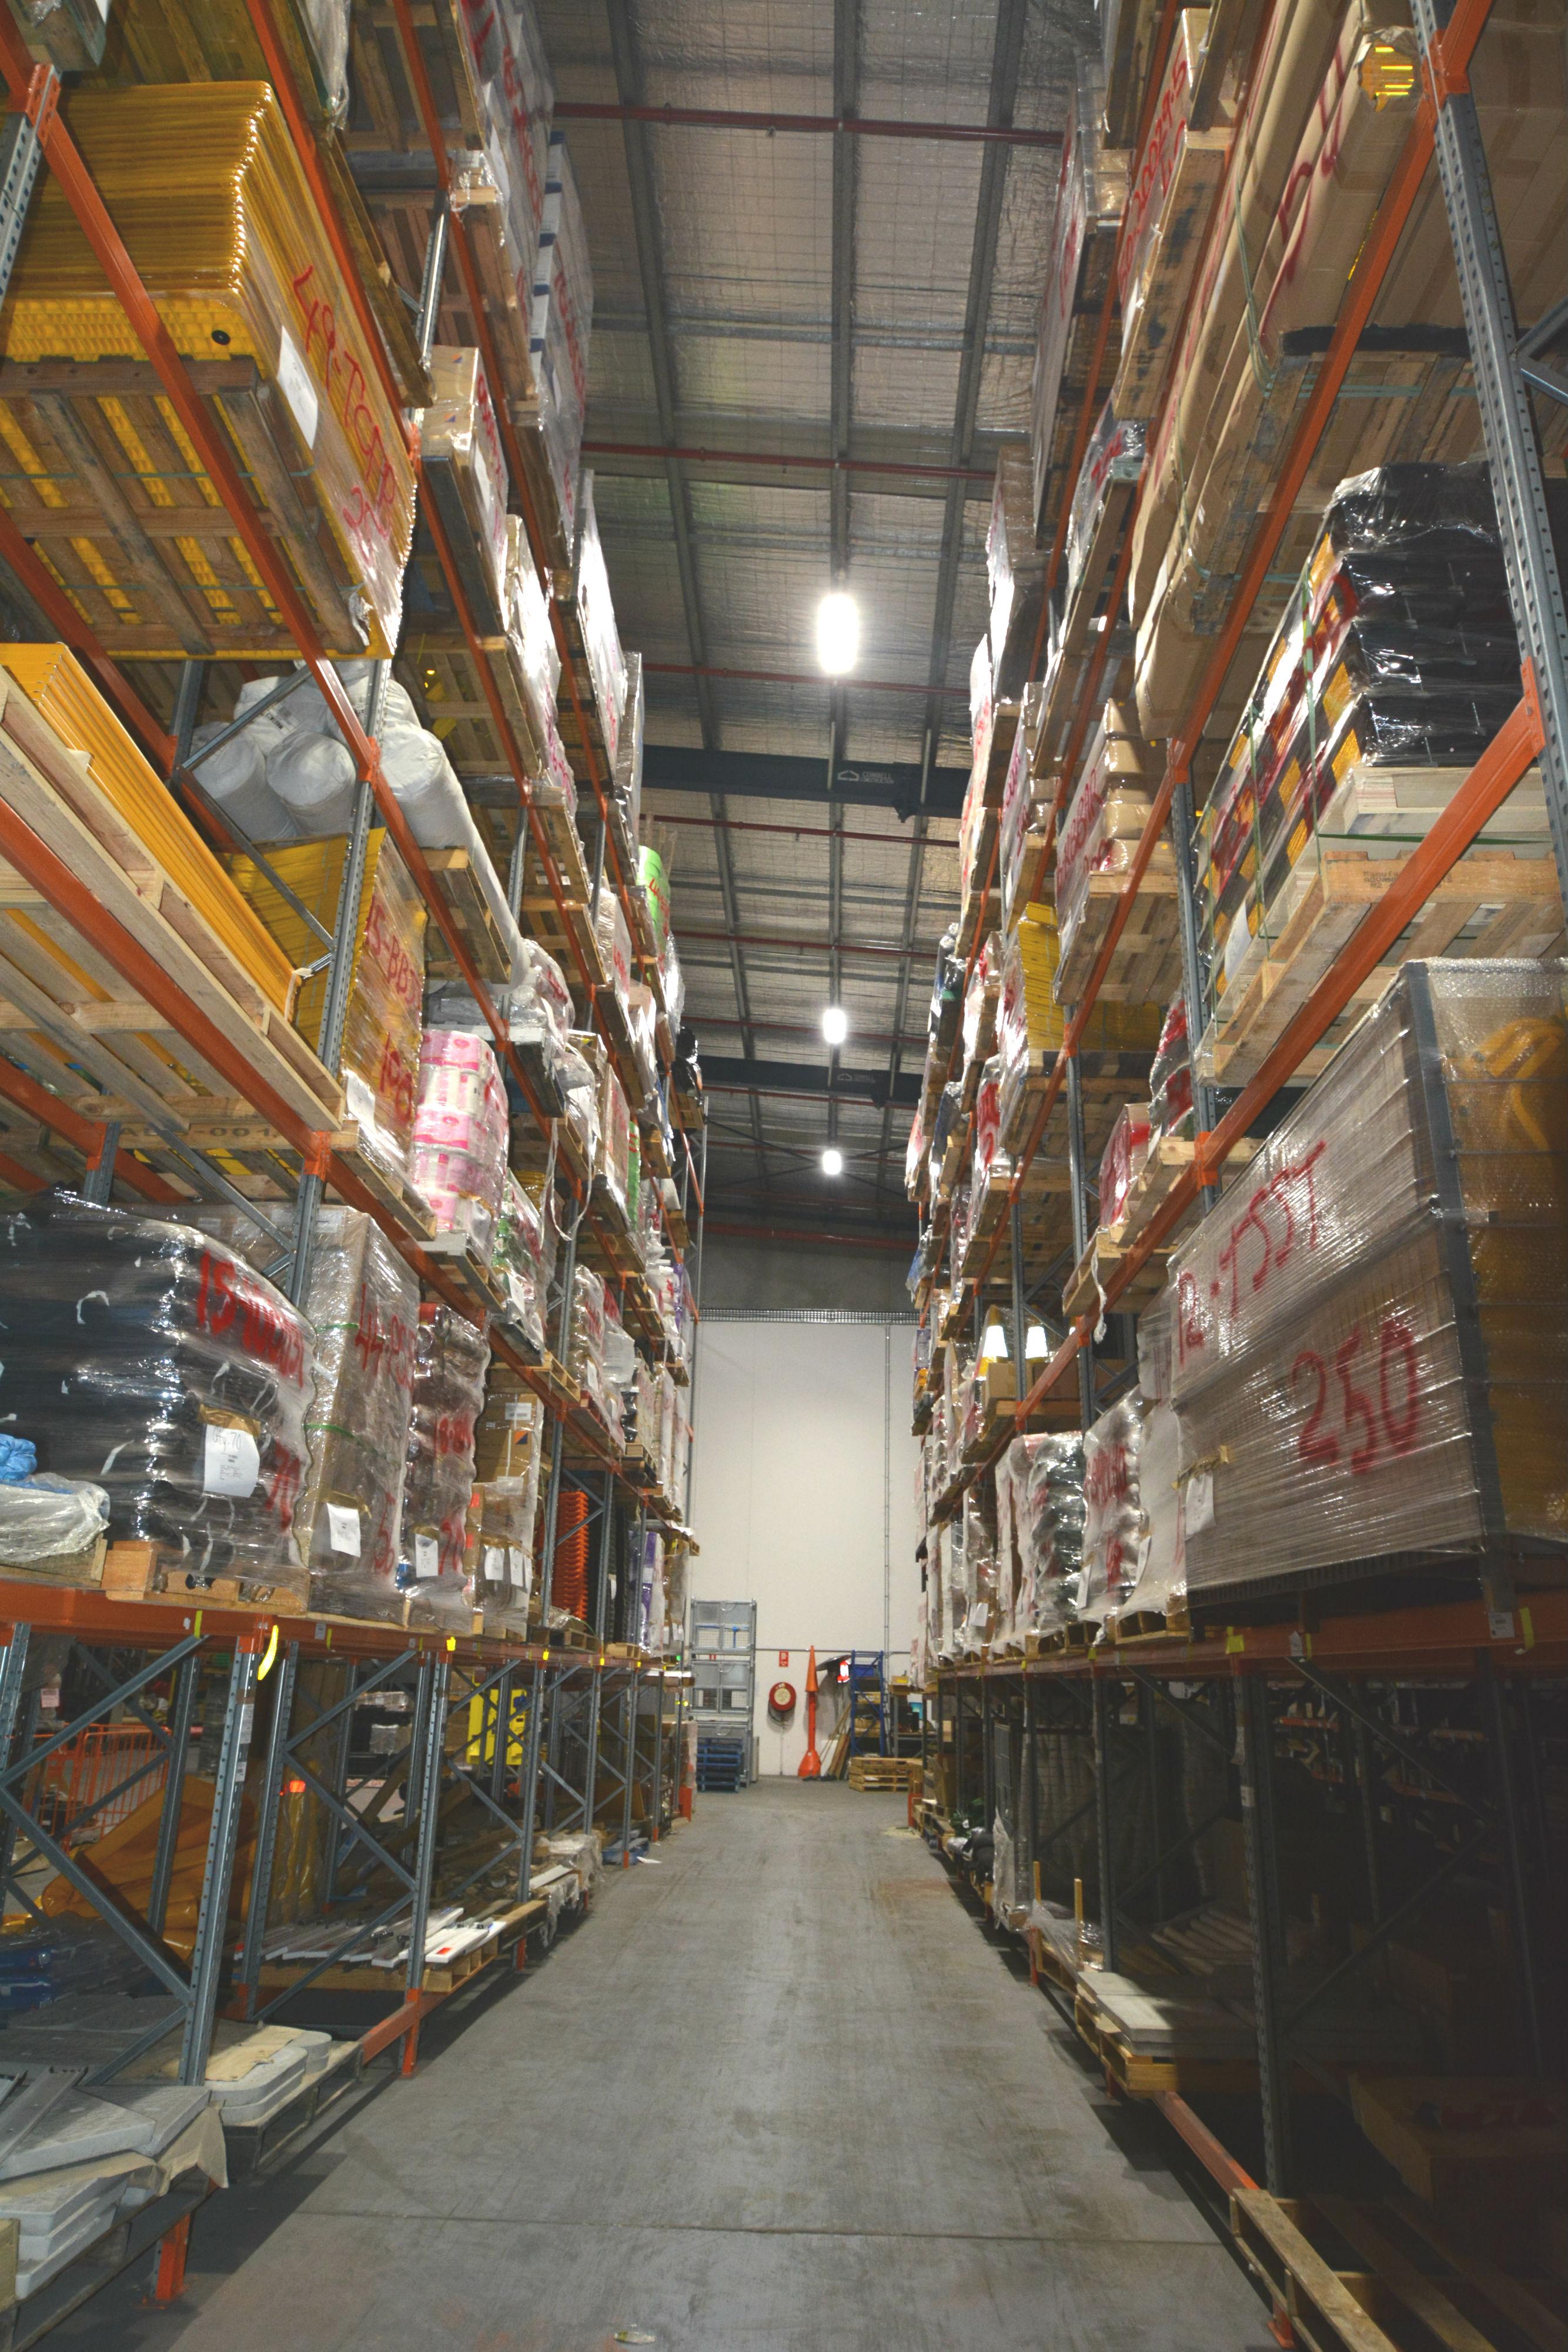 Jaybro Warehouse - LED Weatherproof Batten Lighting